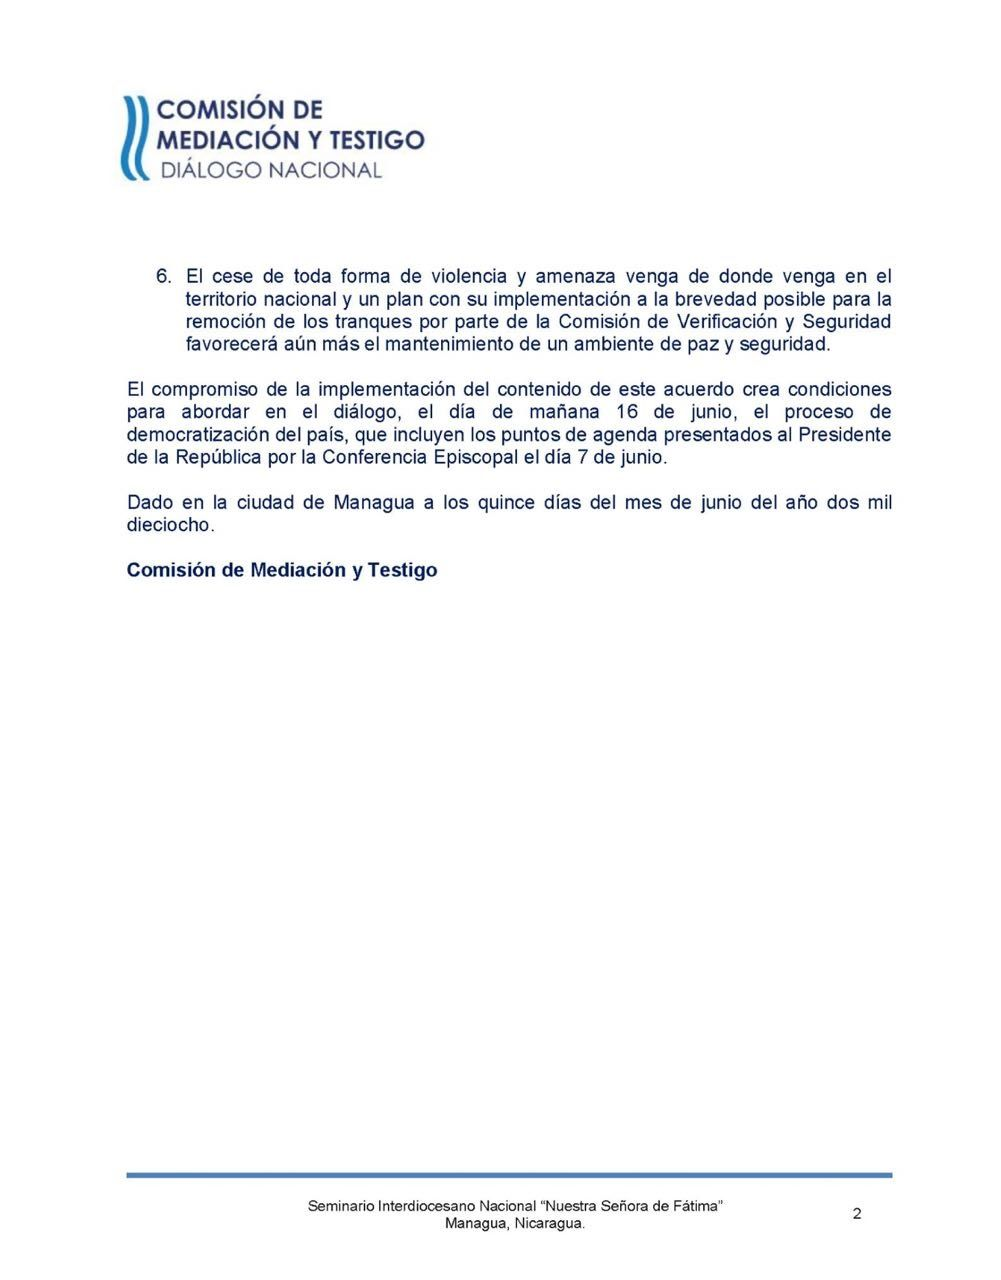 Embajador de EEUU ante OEA llega a Nicaragua previo a sesión extraordinaria